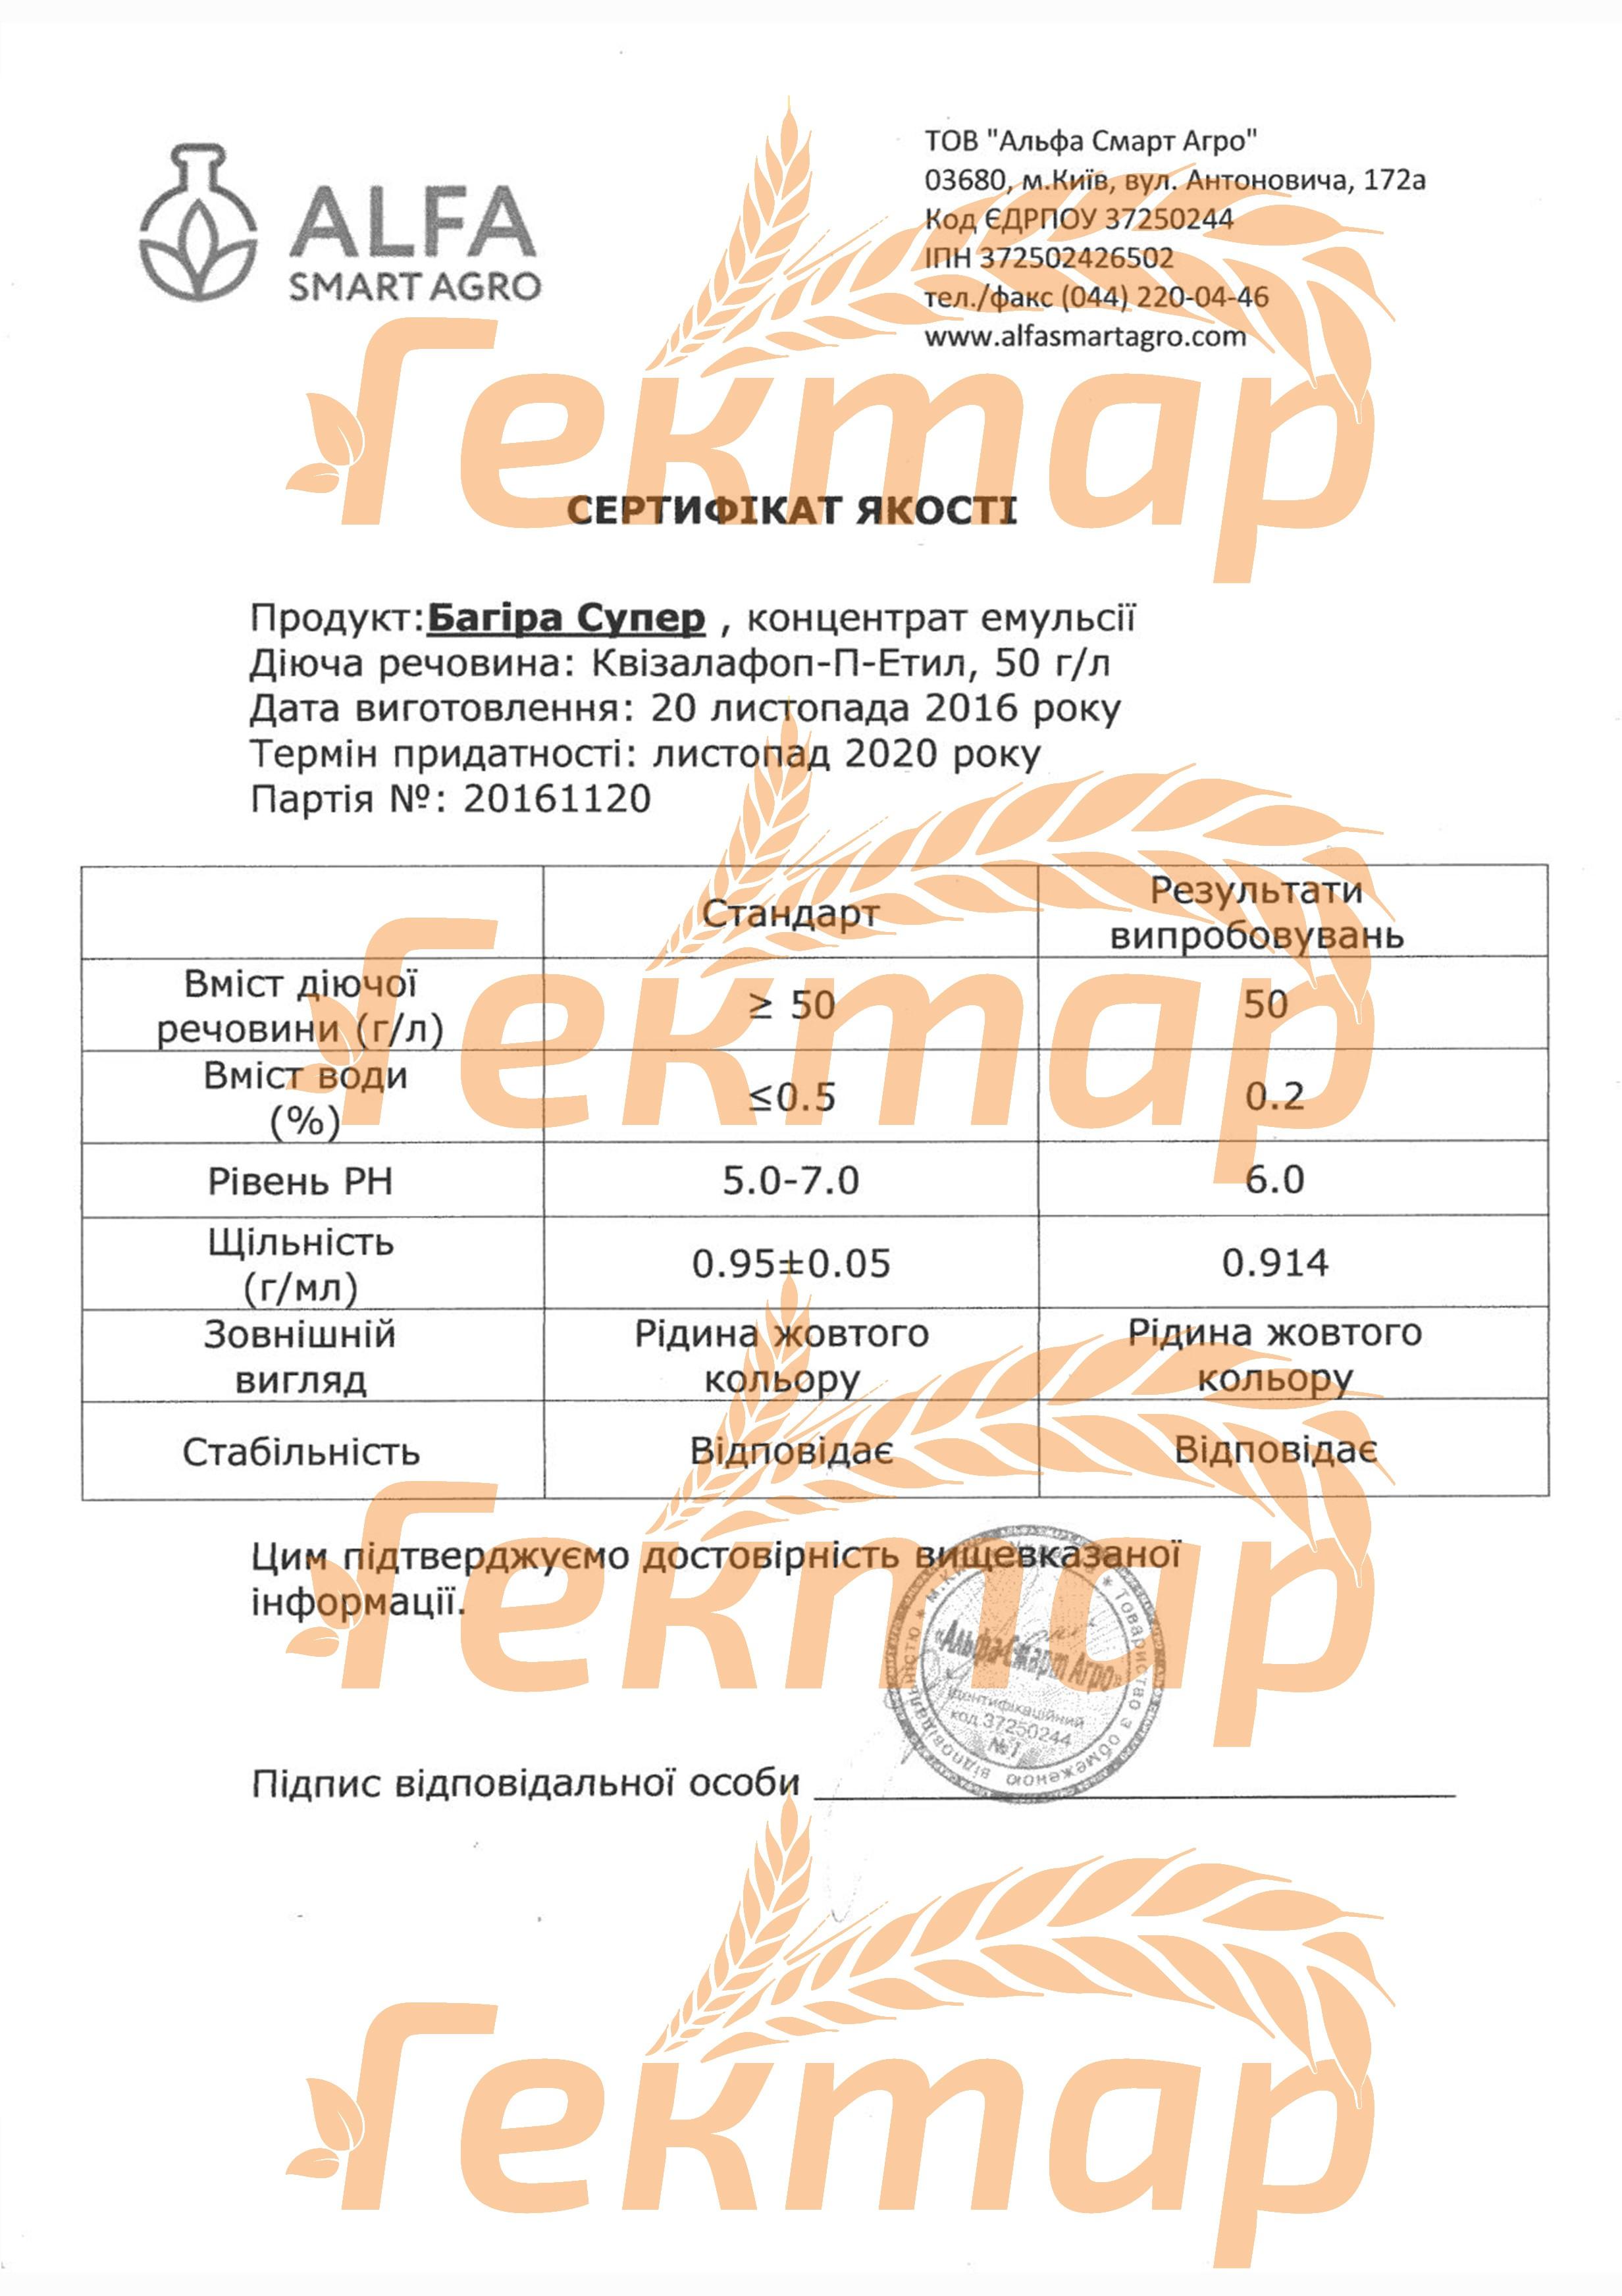 https://hectare.ua/upload/5aafa938a8ff7.jpg